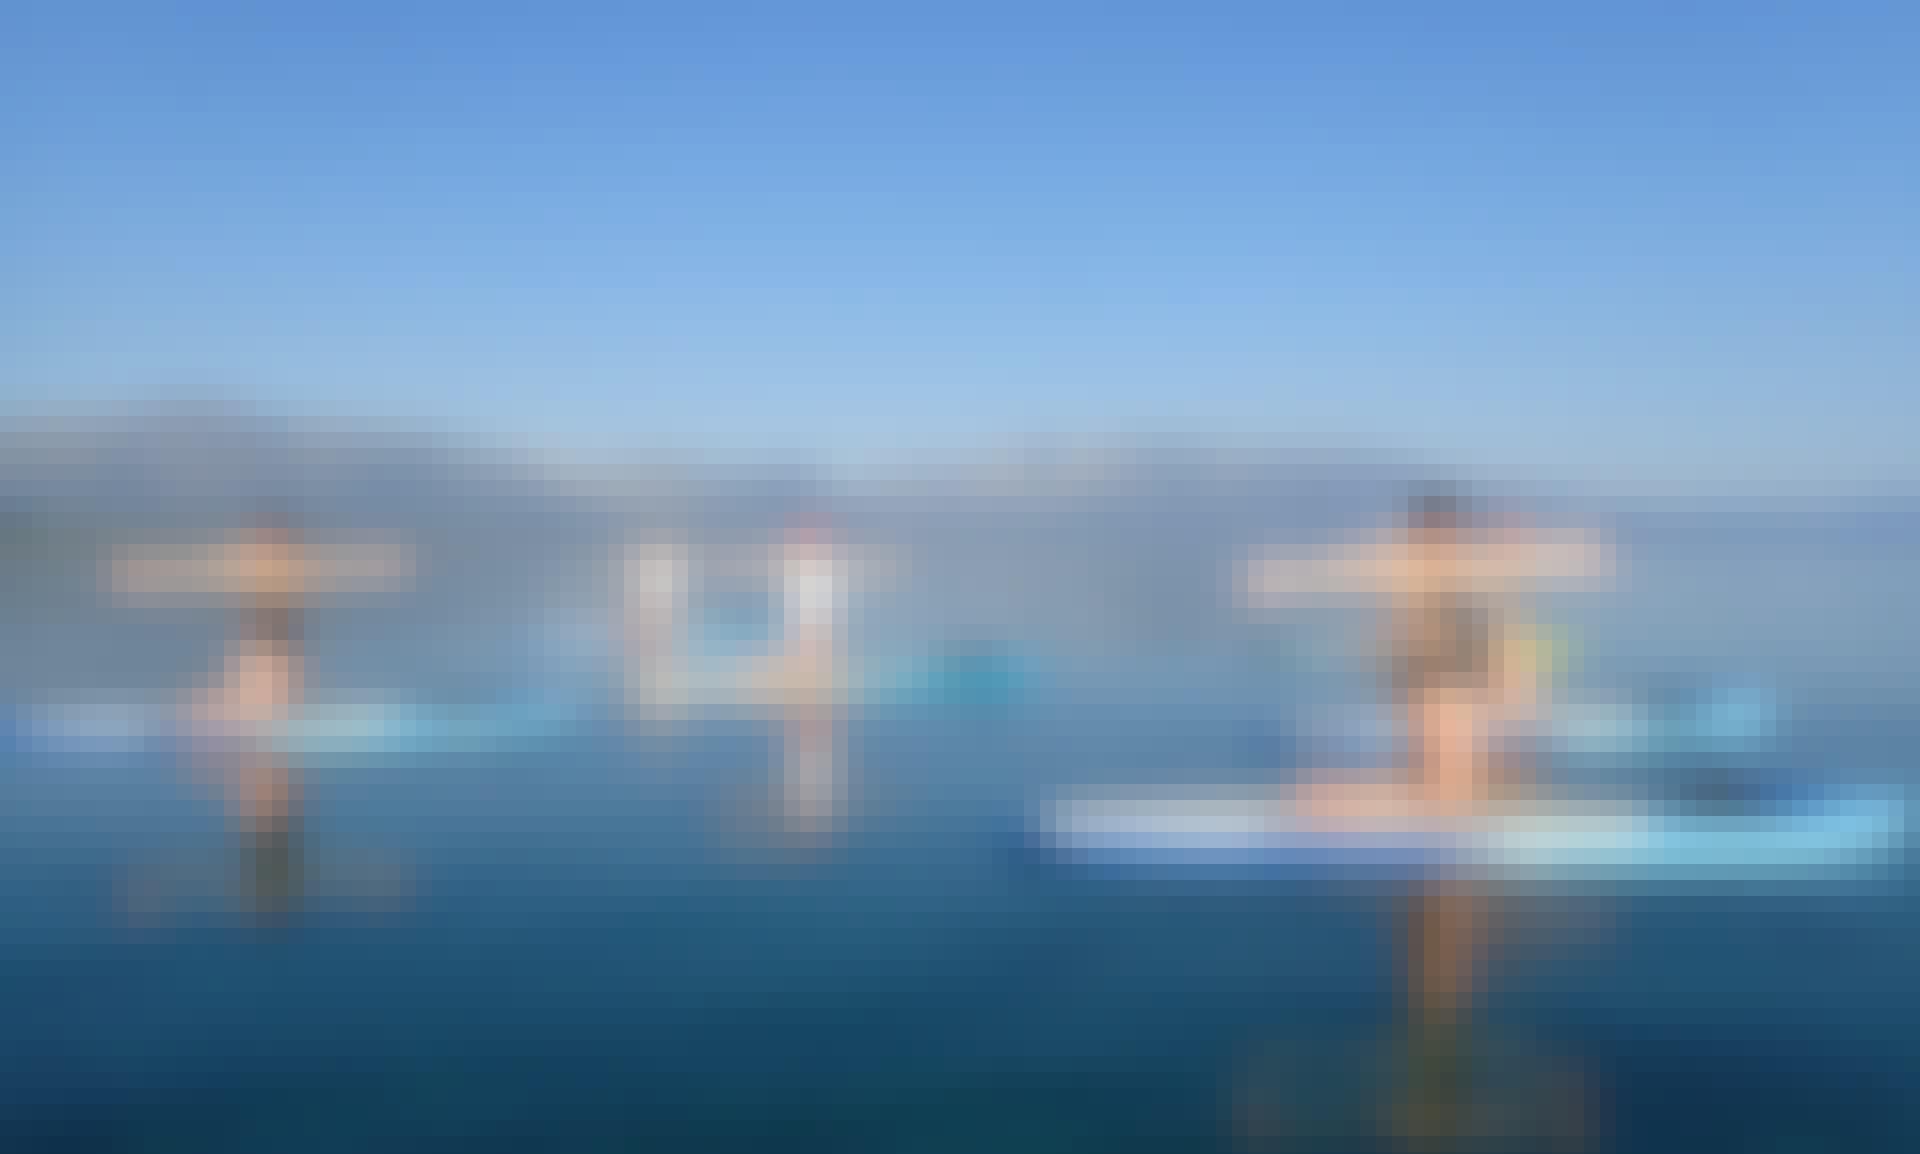 Paddle Board Yoga in South Lake Tahoe with Lake Tahoe Yoga